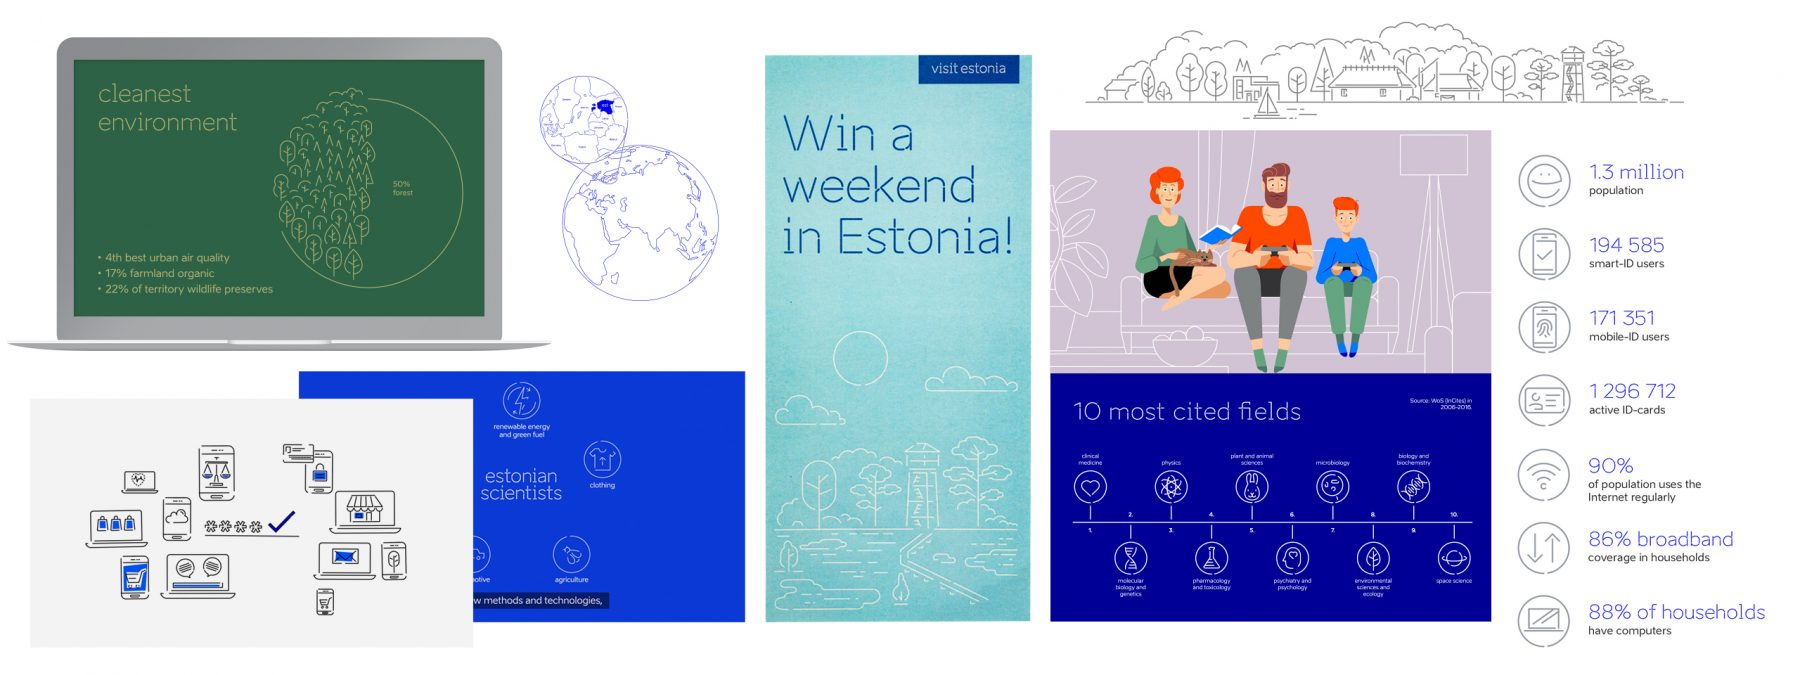 brand estonia illustrations examples